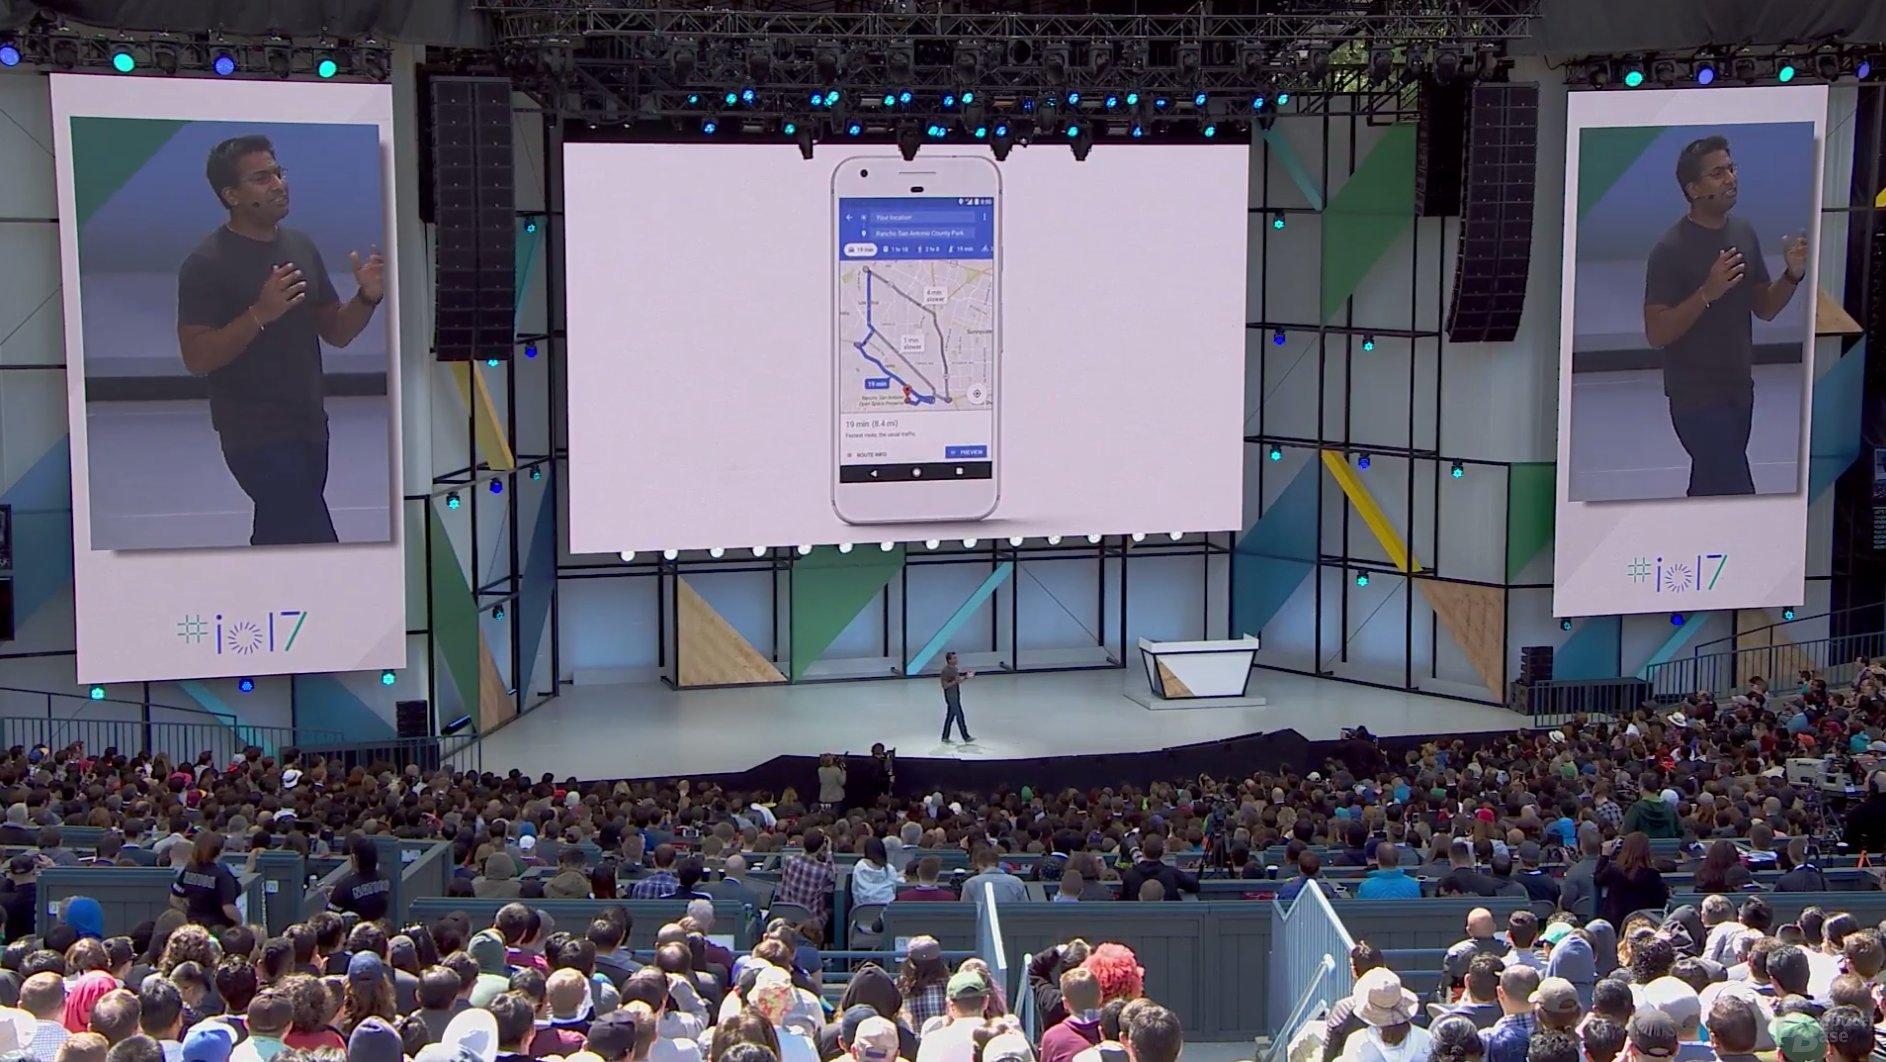 Visuelles Feedback auf dem Smartphones